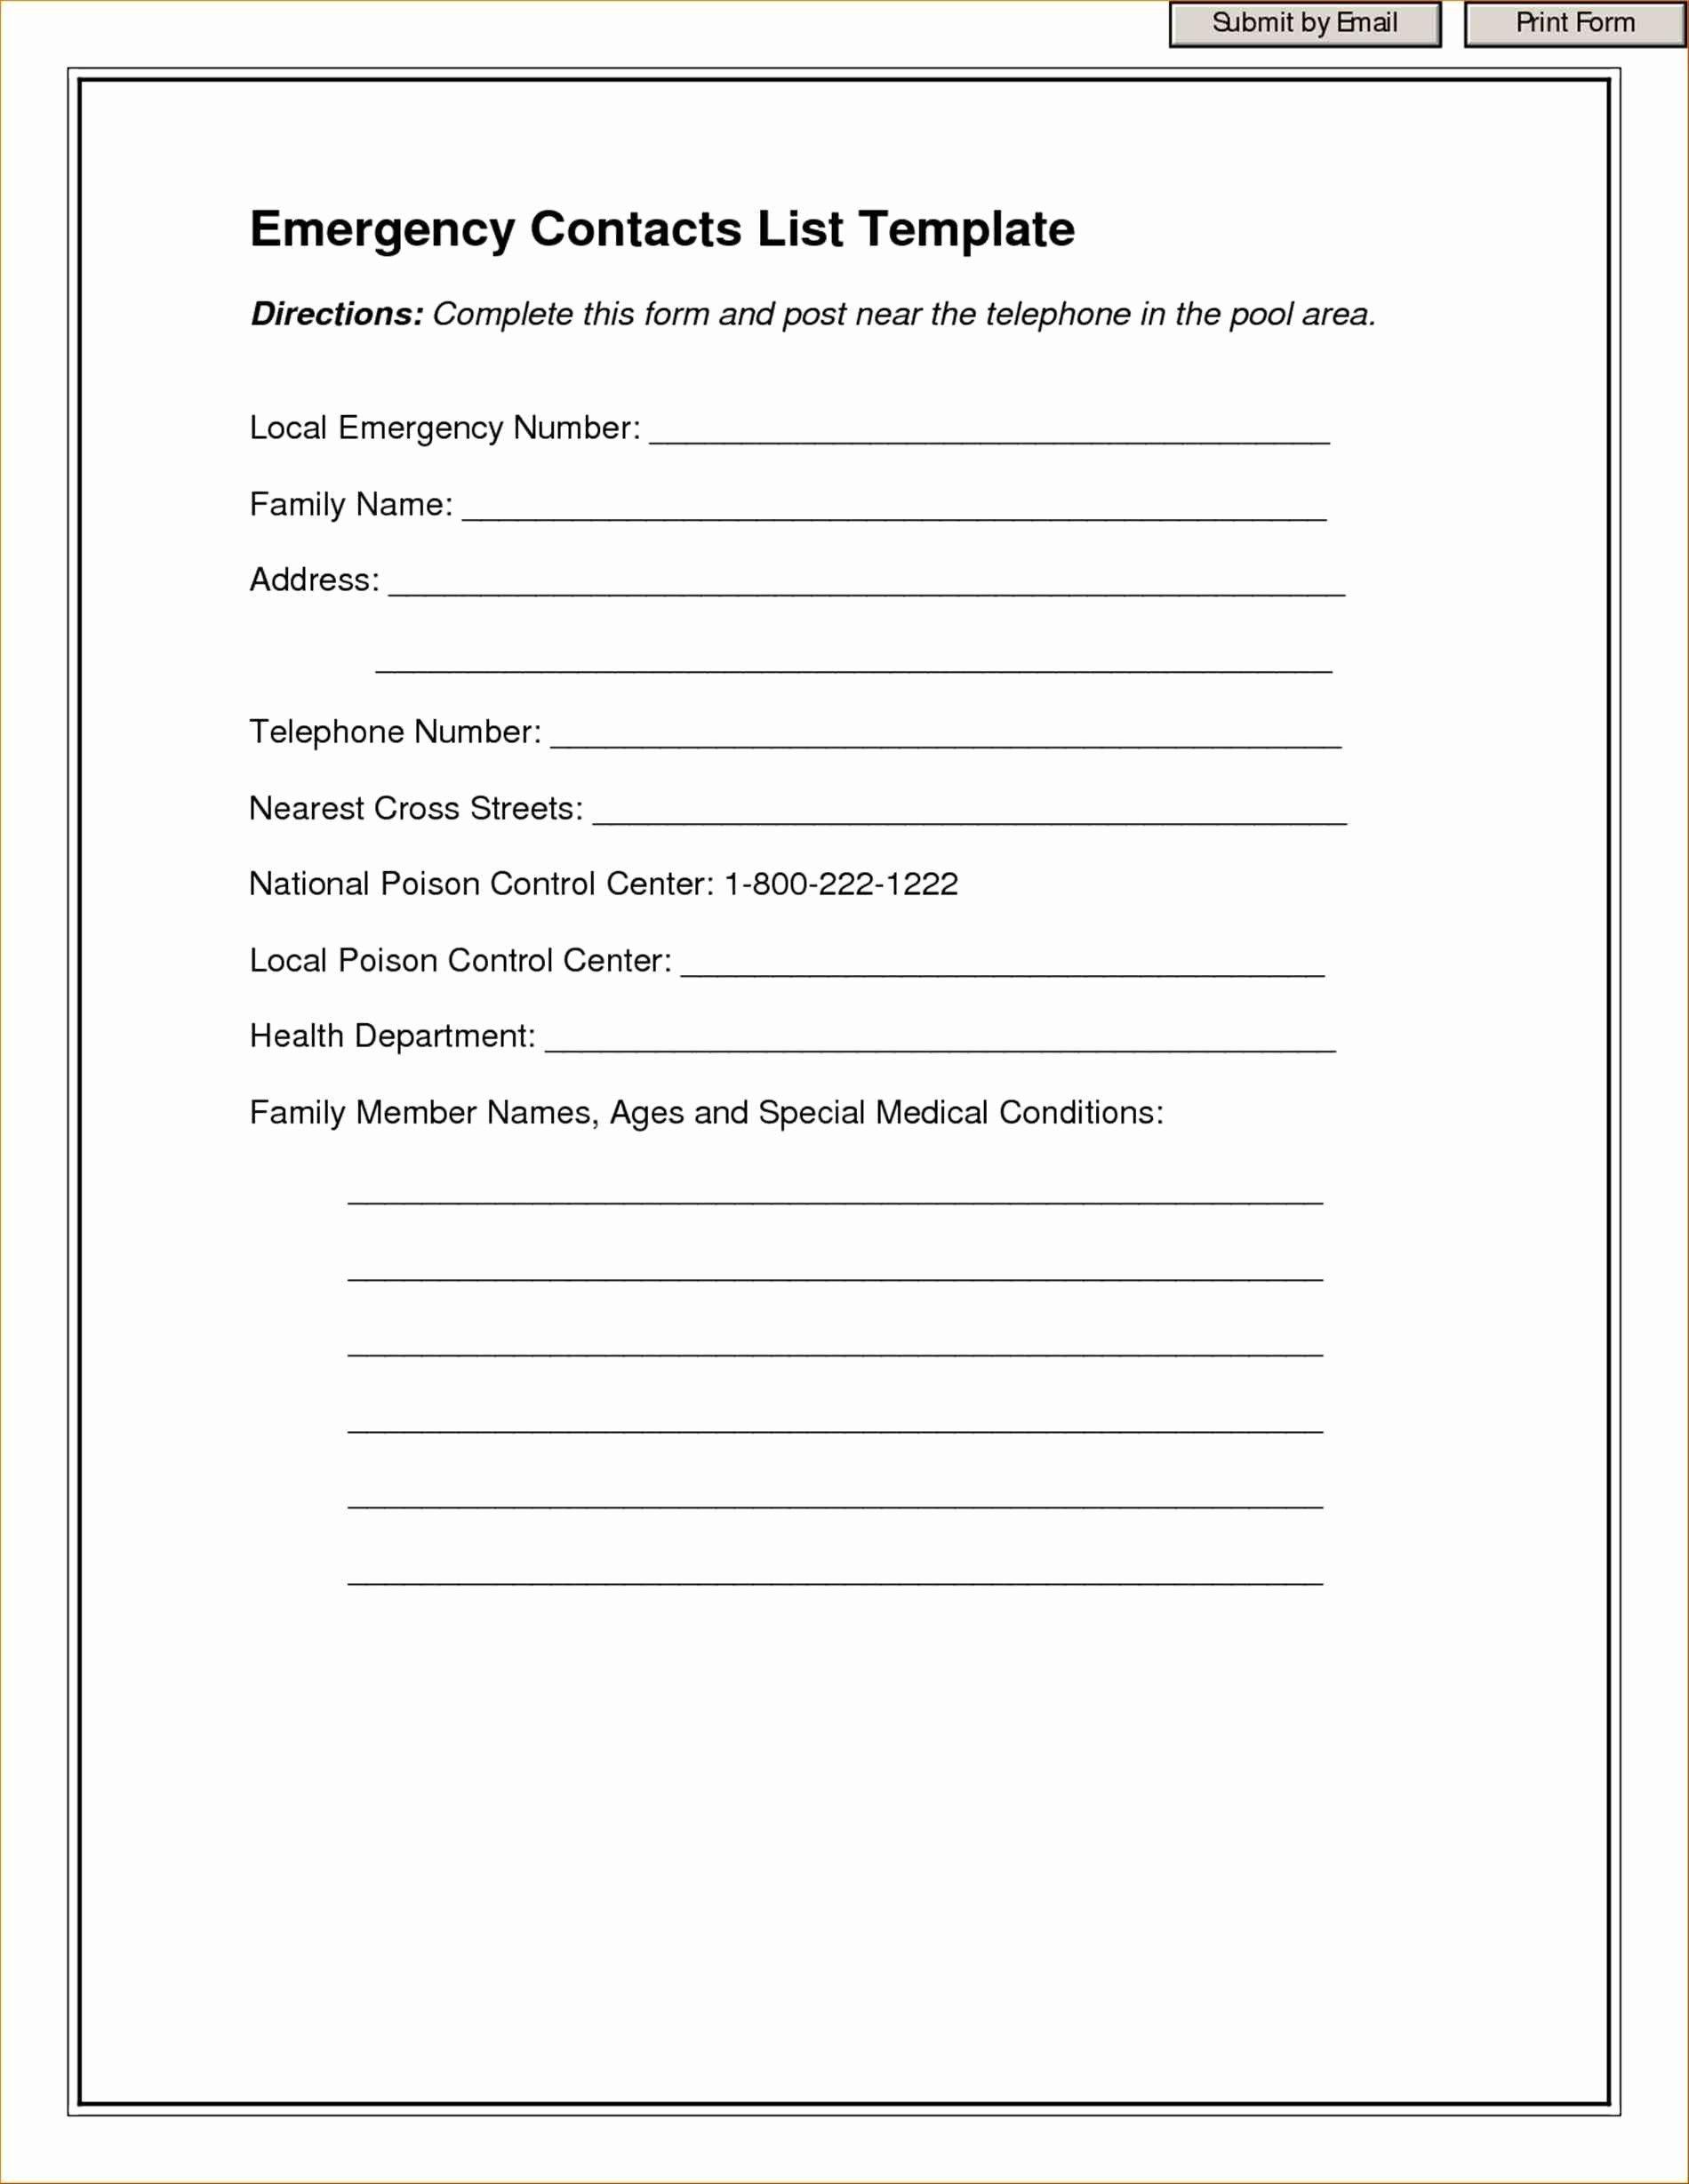 new client list template xls xlsformat xlstemplates  medical billing resume employment gap explanation sample cv format word free download 2018